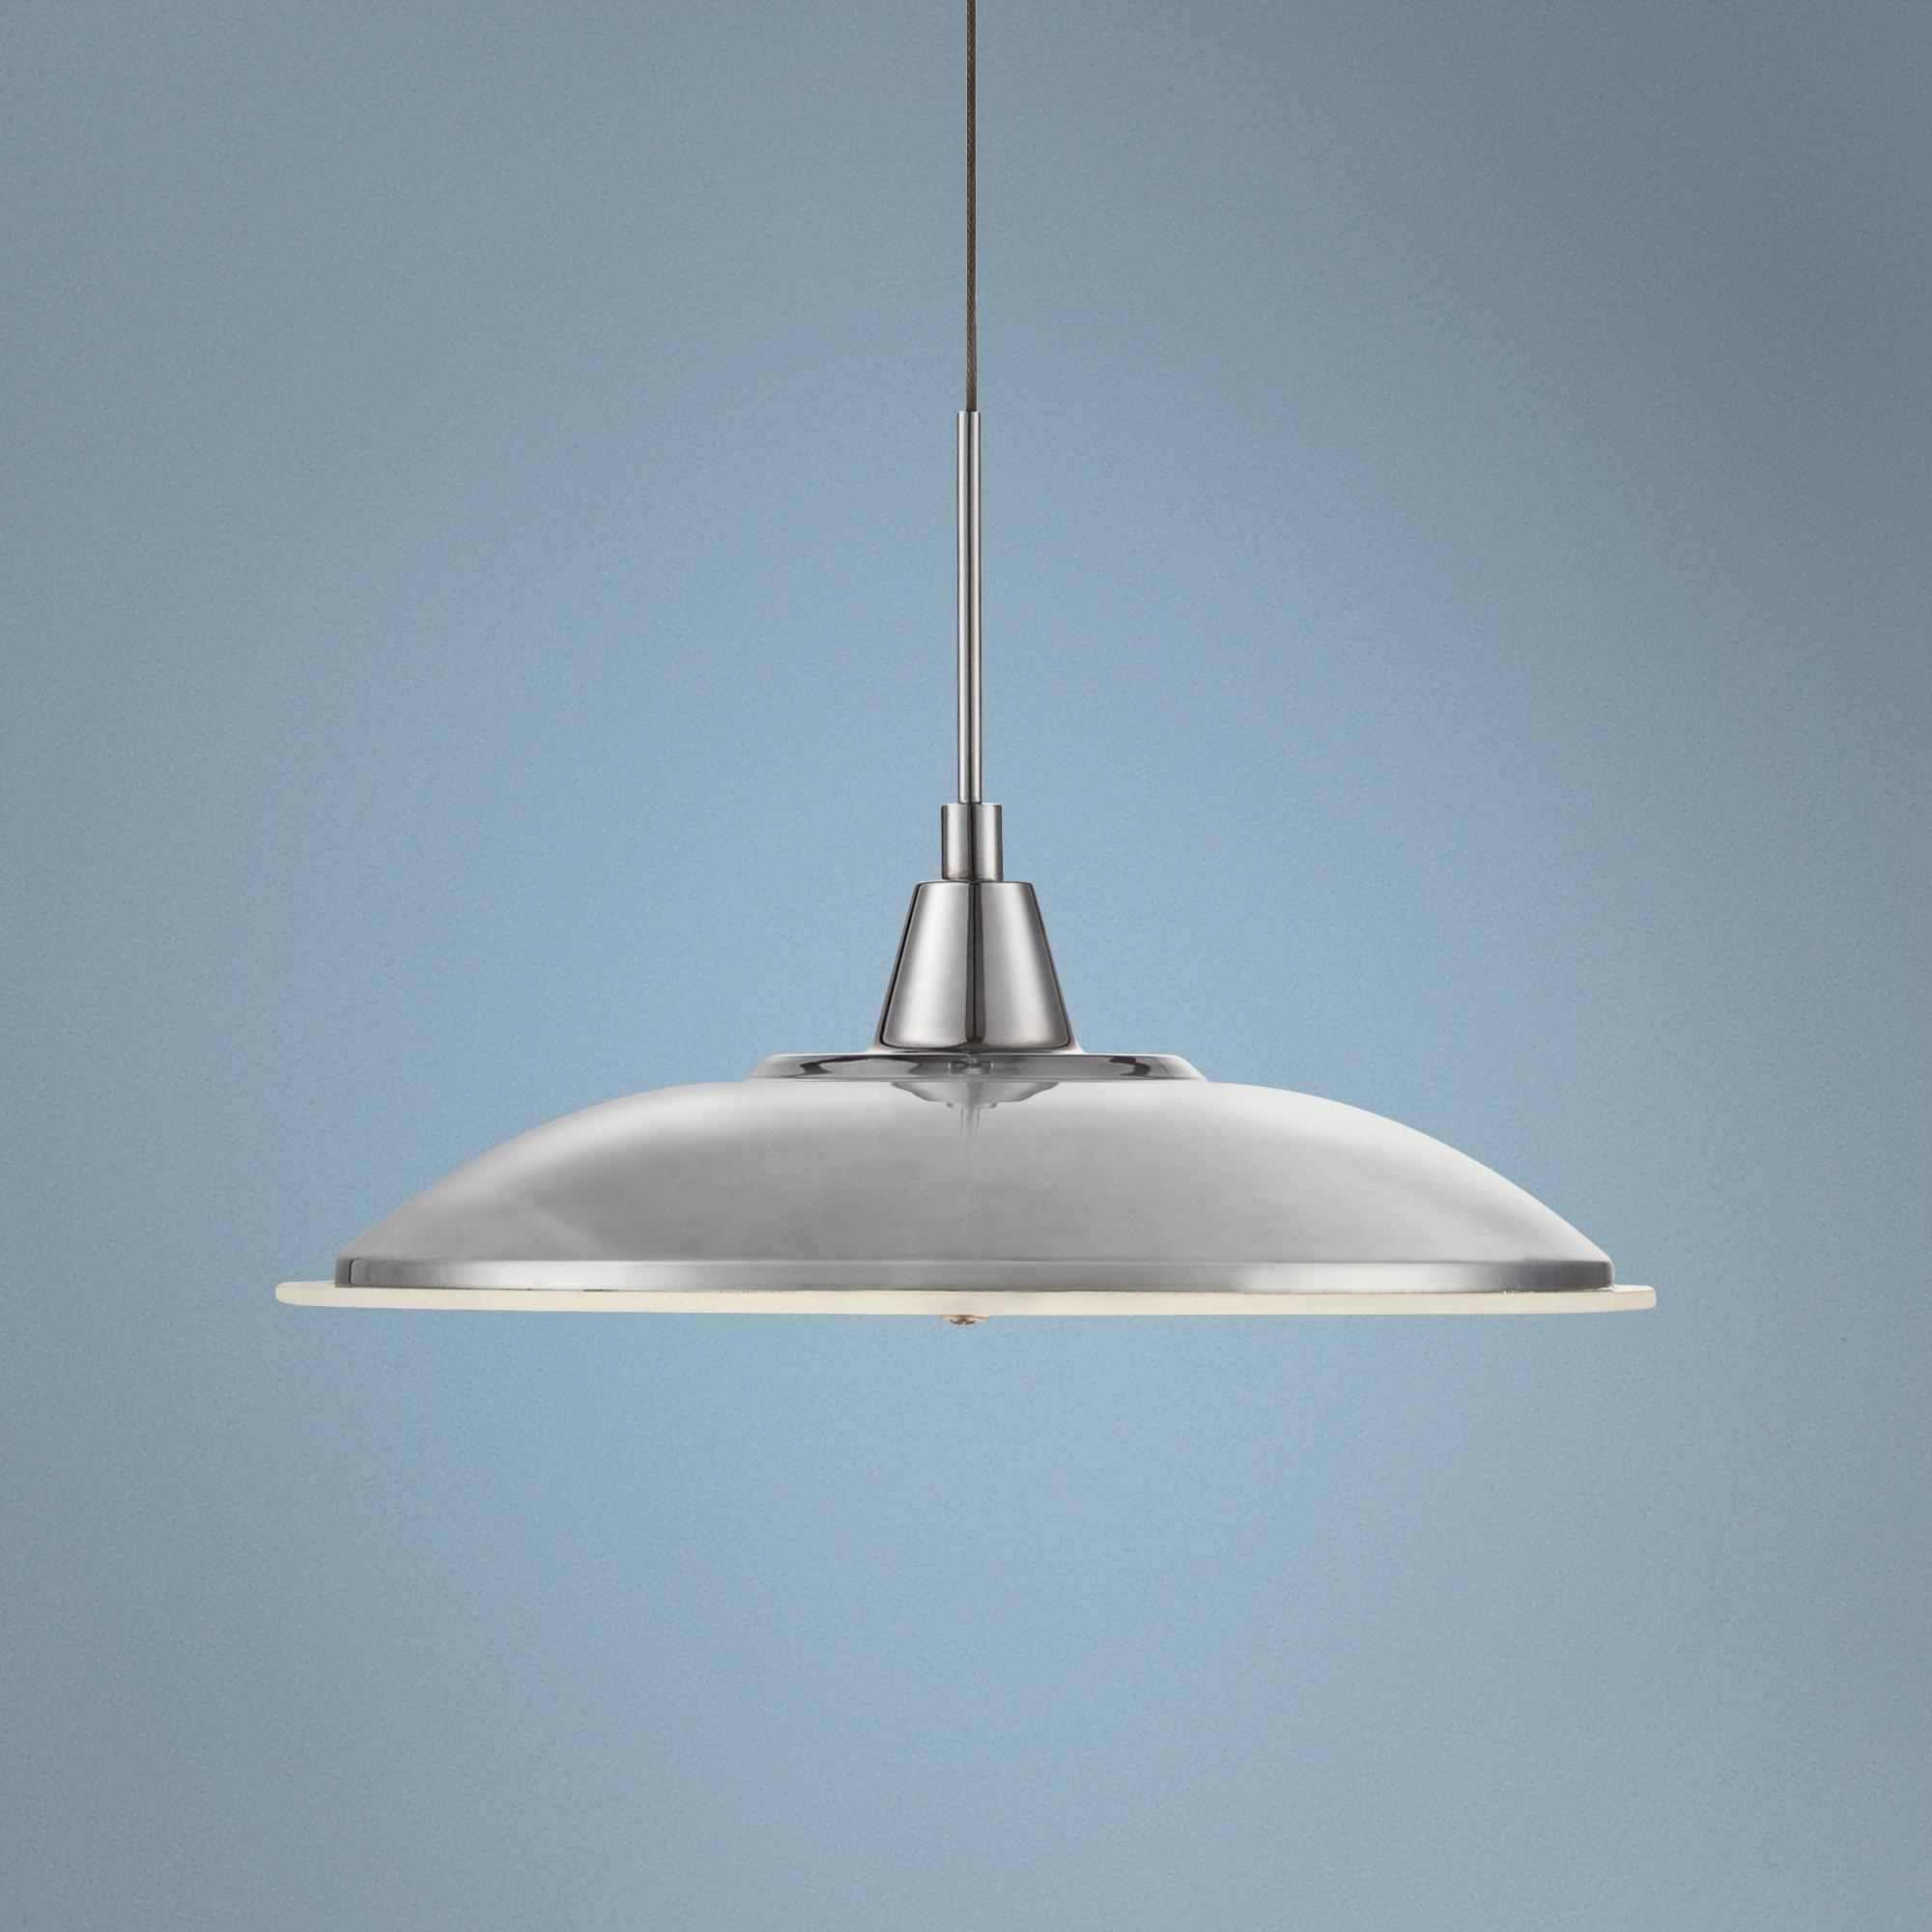 Chrome Saucer 11 Wide LED Pendant Light -   Kitchen   Pinterest ...